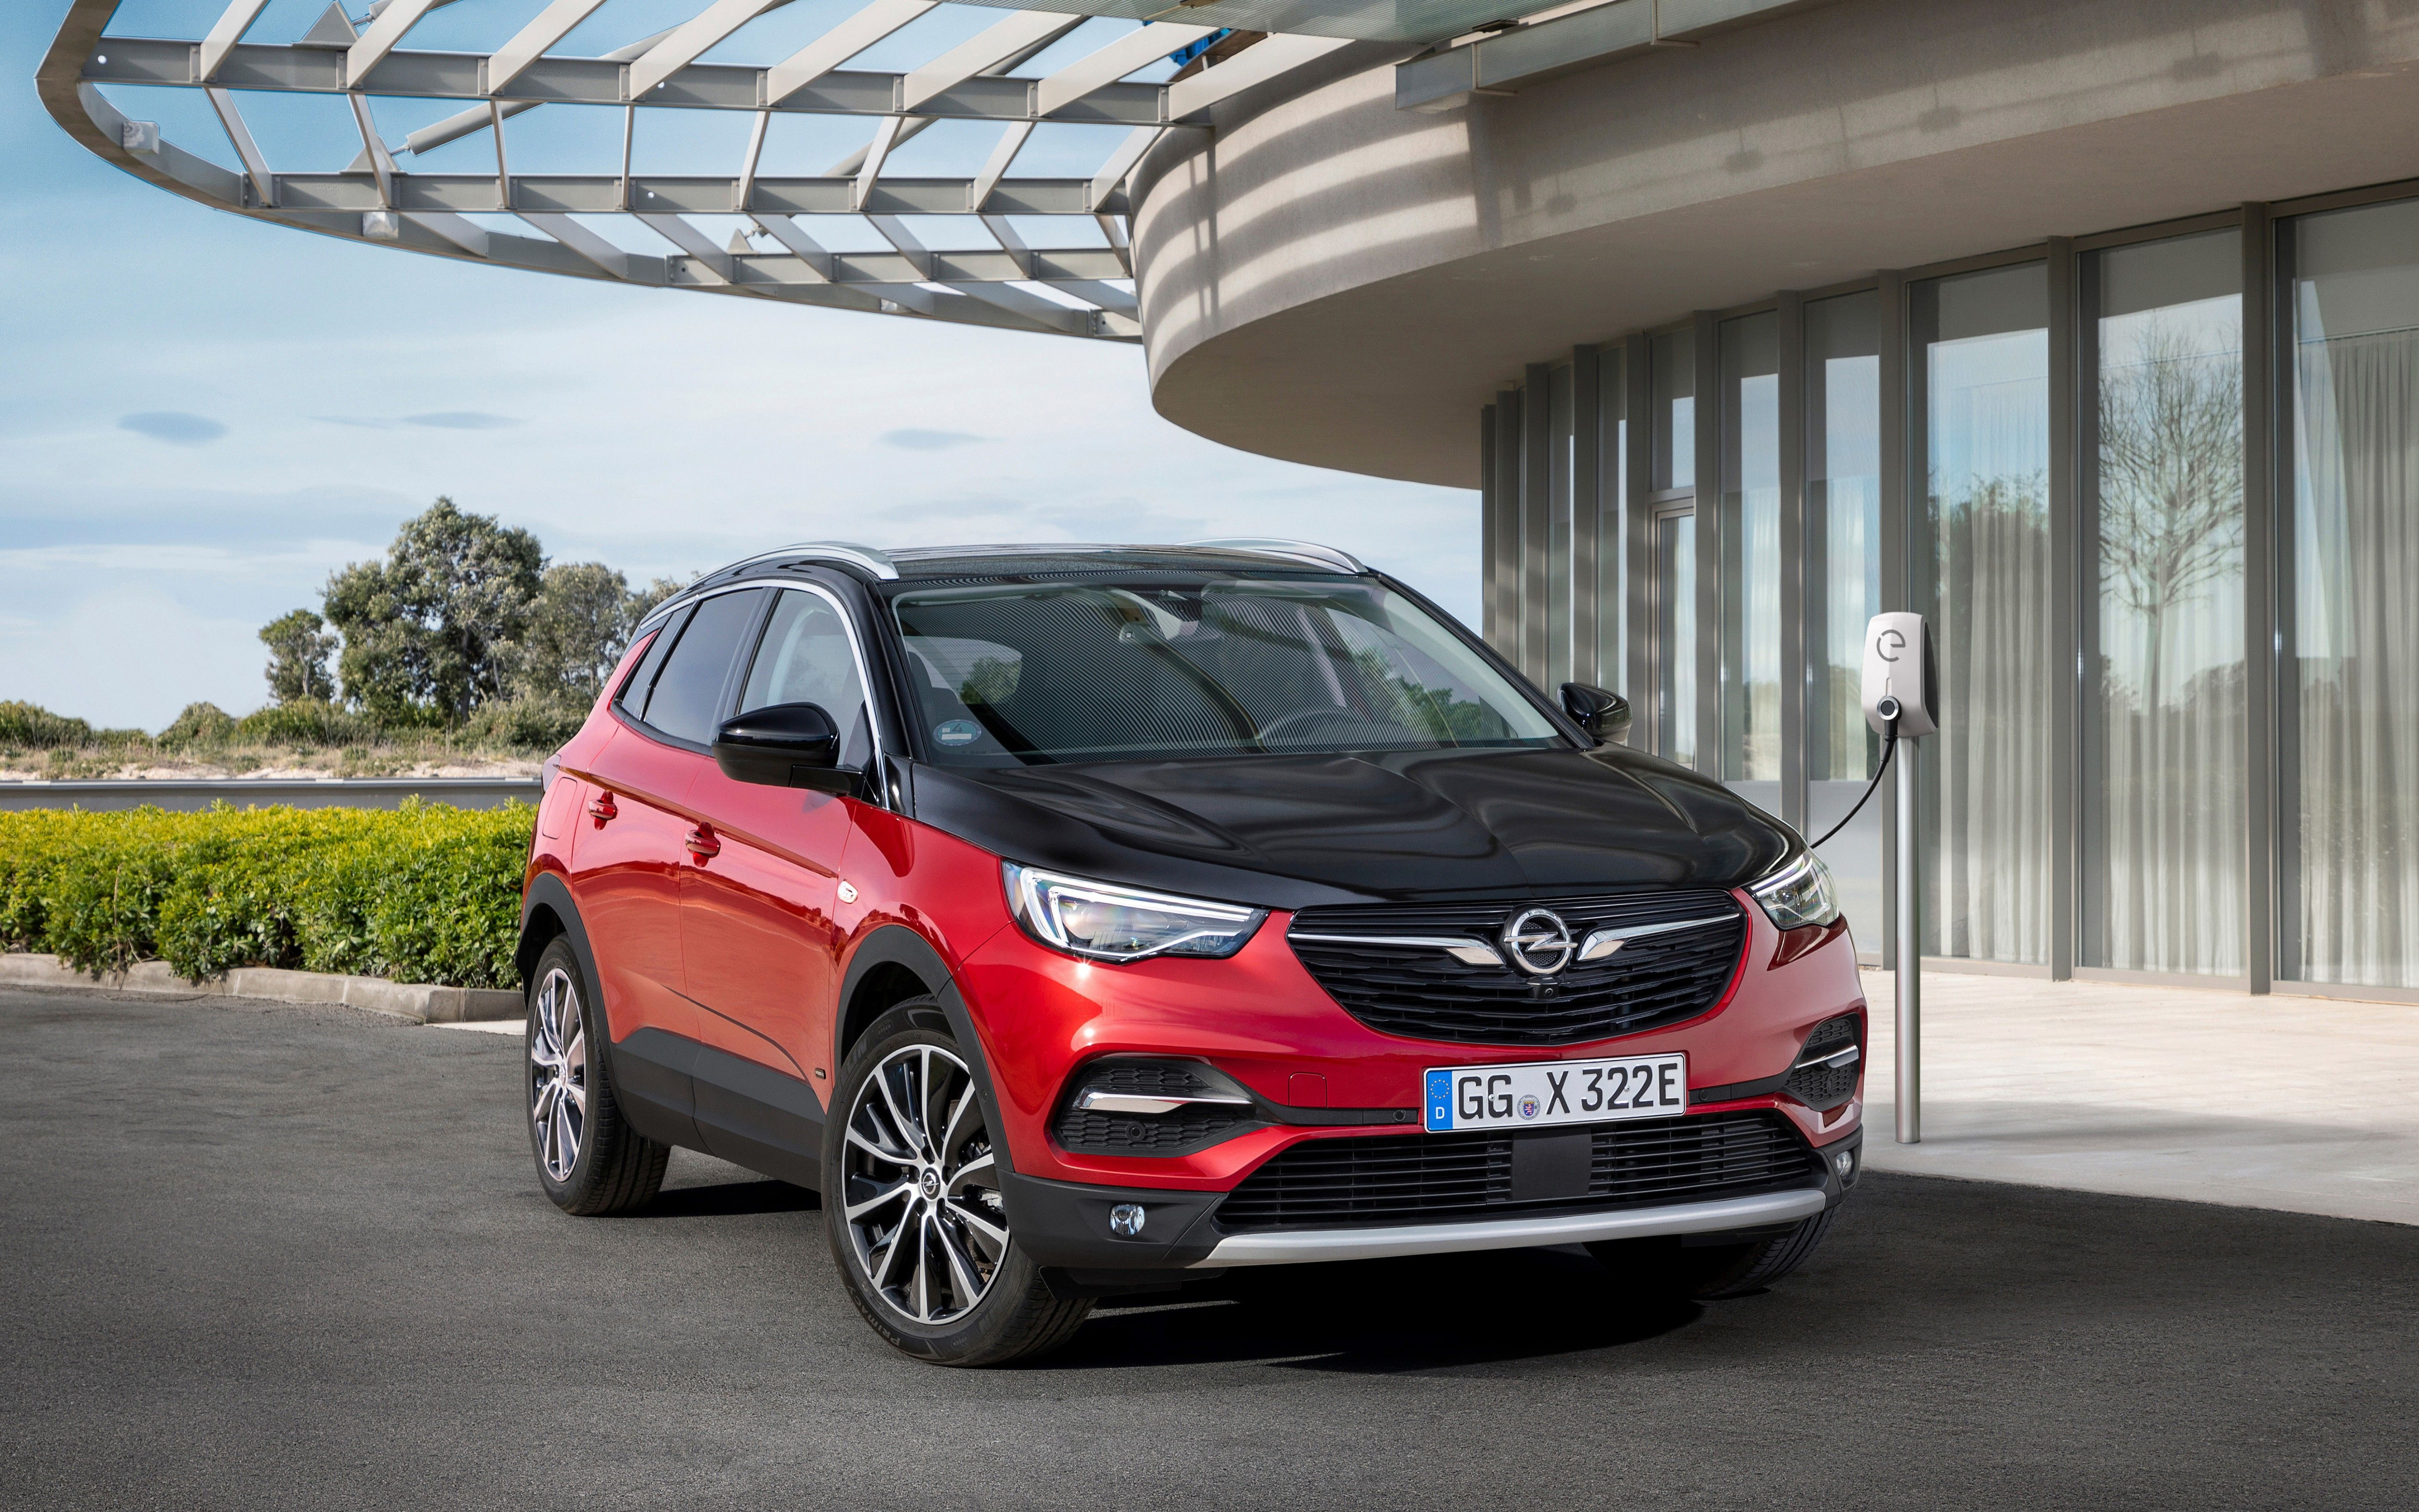 2020 Opel Crossland X Hybrid Car Vauxhall Opel